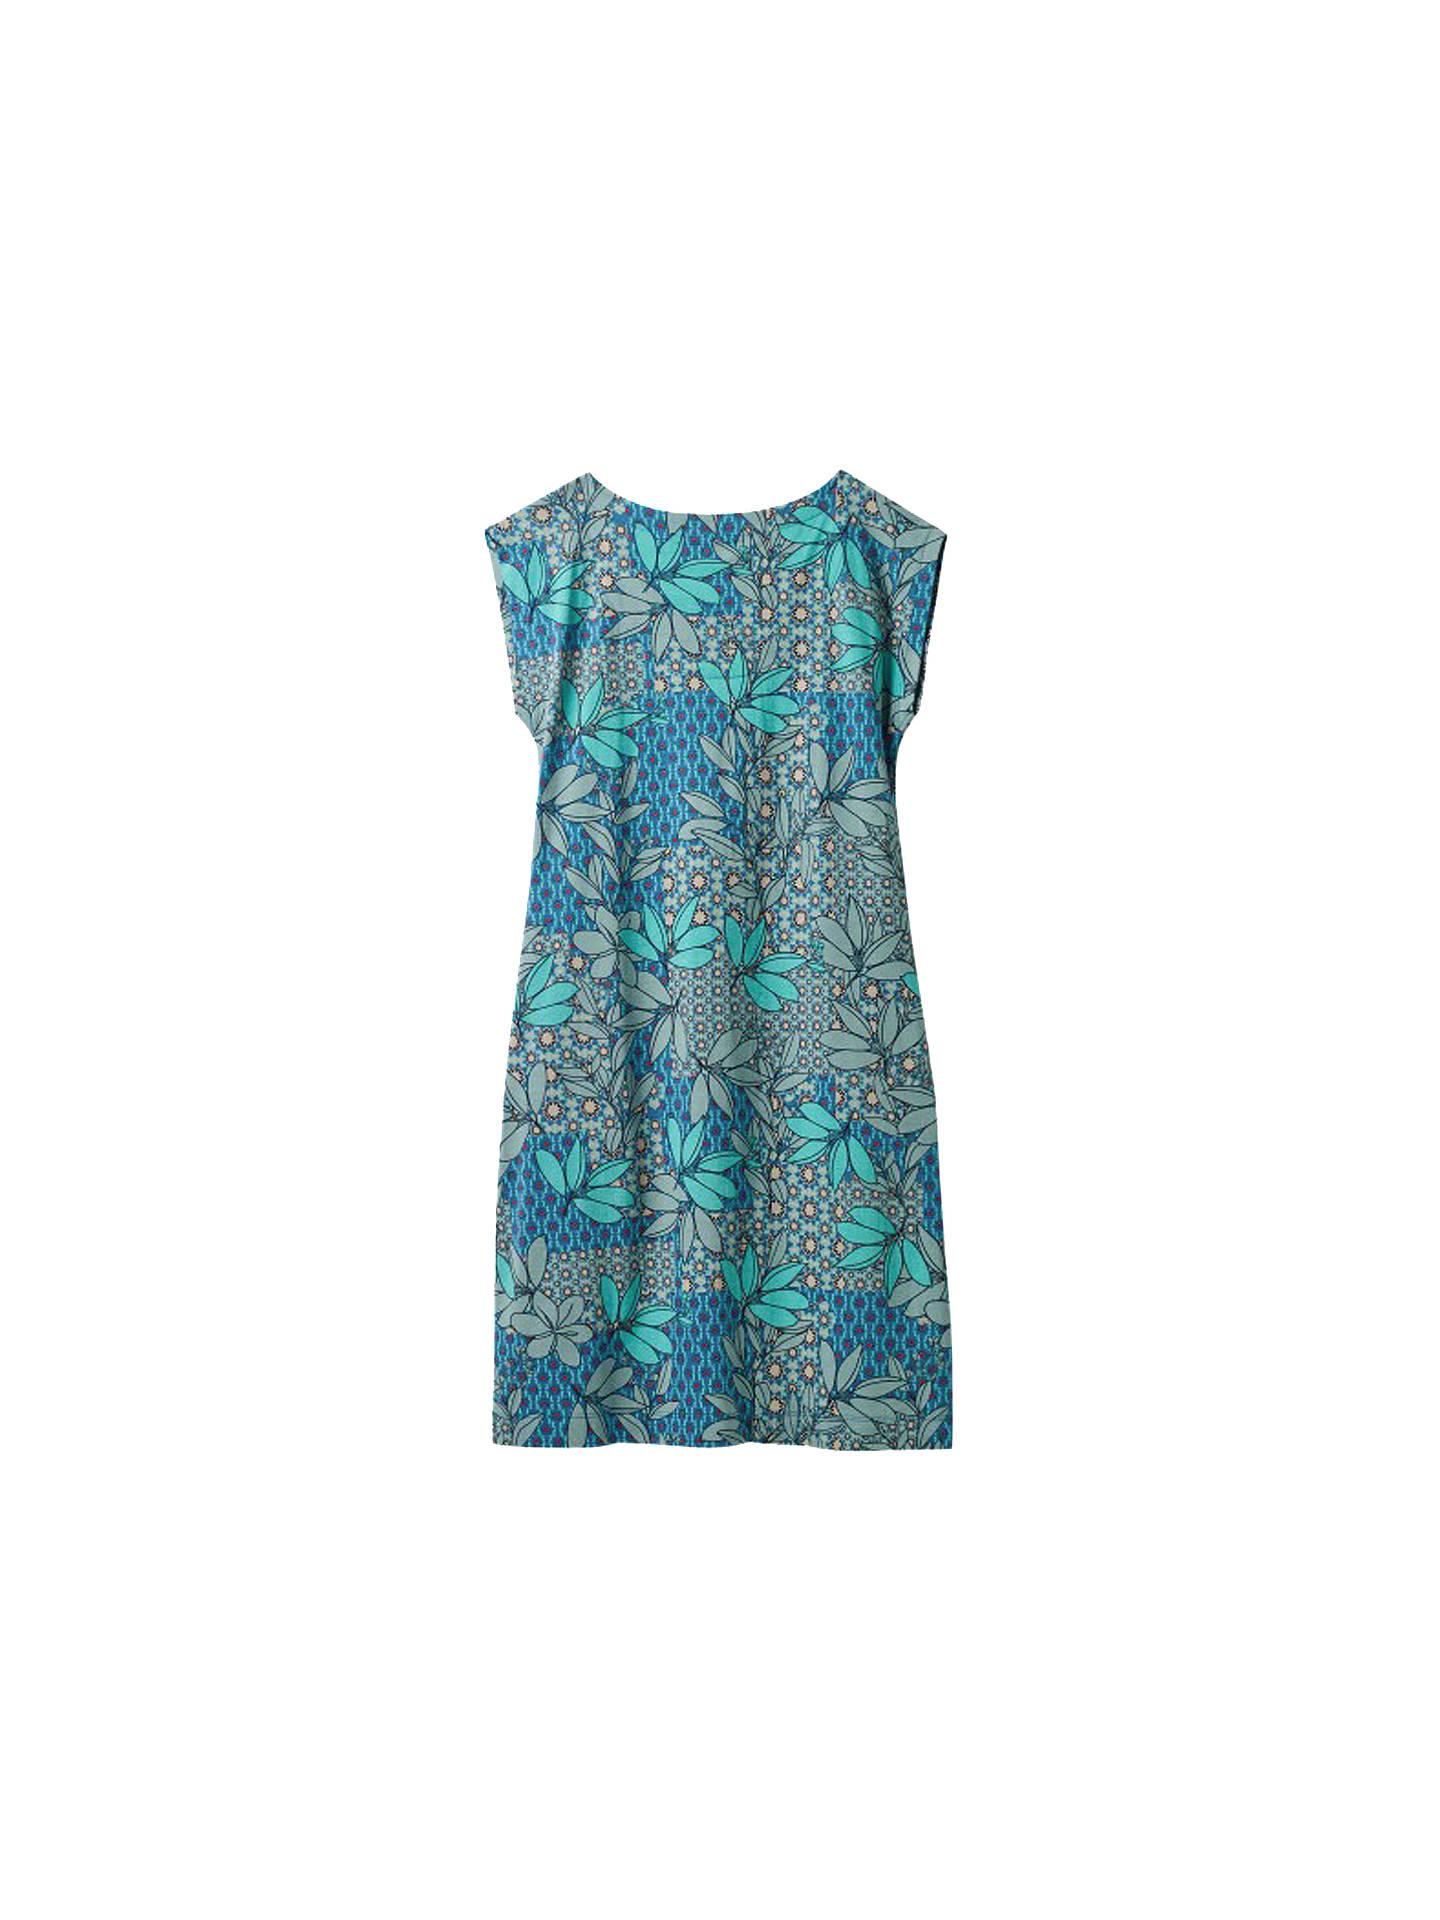 0ac8aa4269 ... Buy White Stuff Lena Dress, Parakeet, 6 Online at johnlewis.com ...